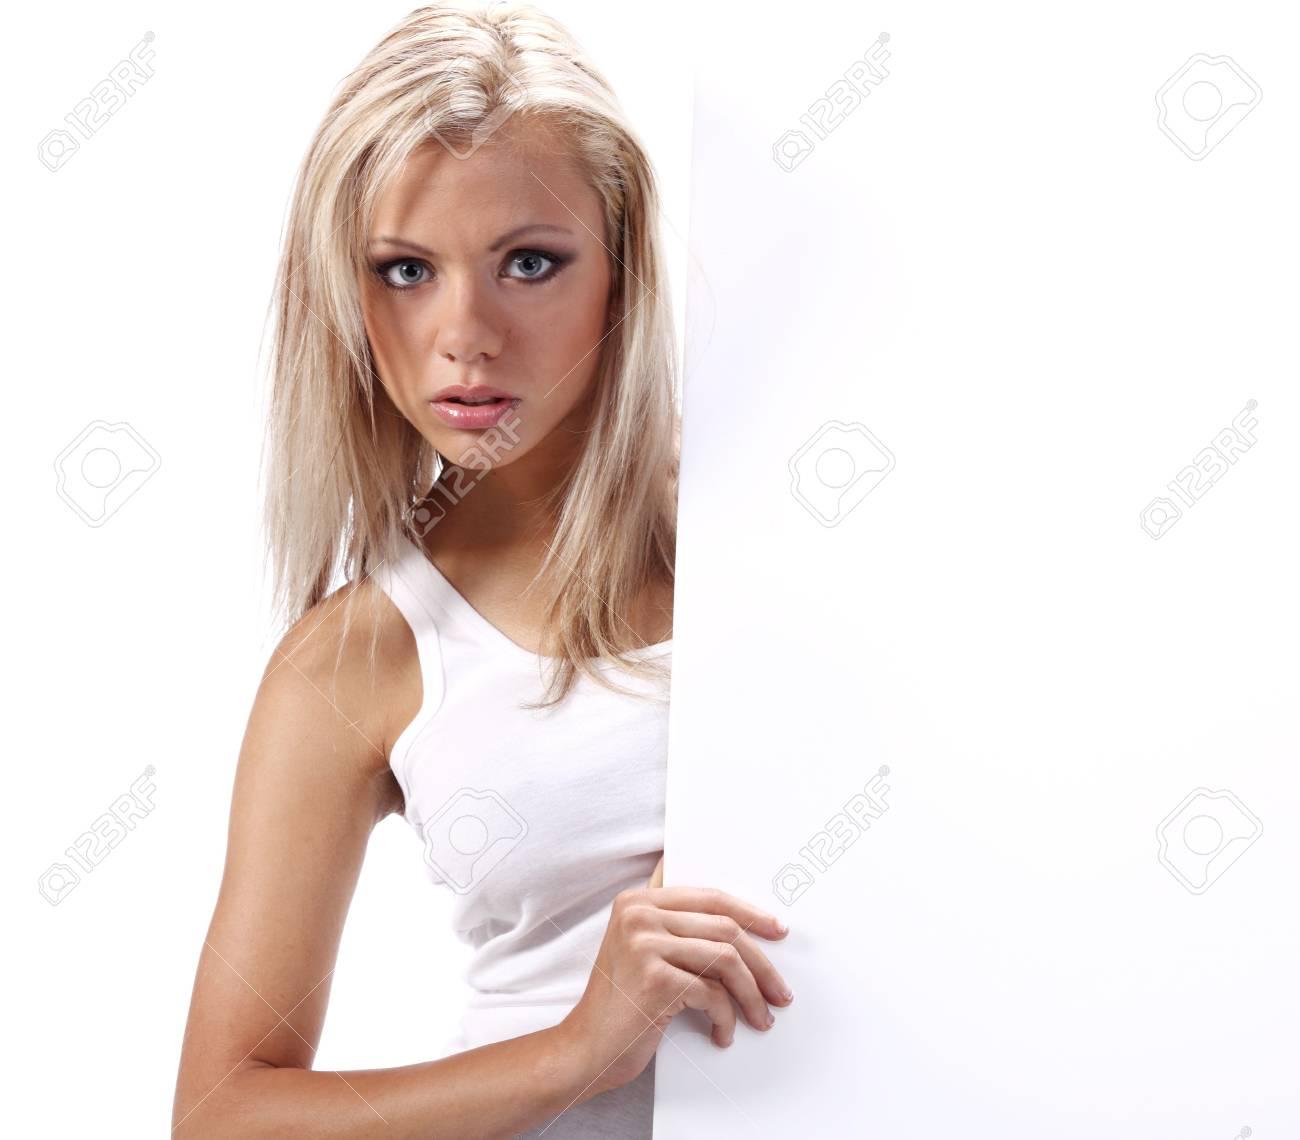 Beautiful blonde girl showing empty white board Stock Photo - 5613001